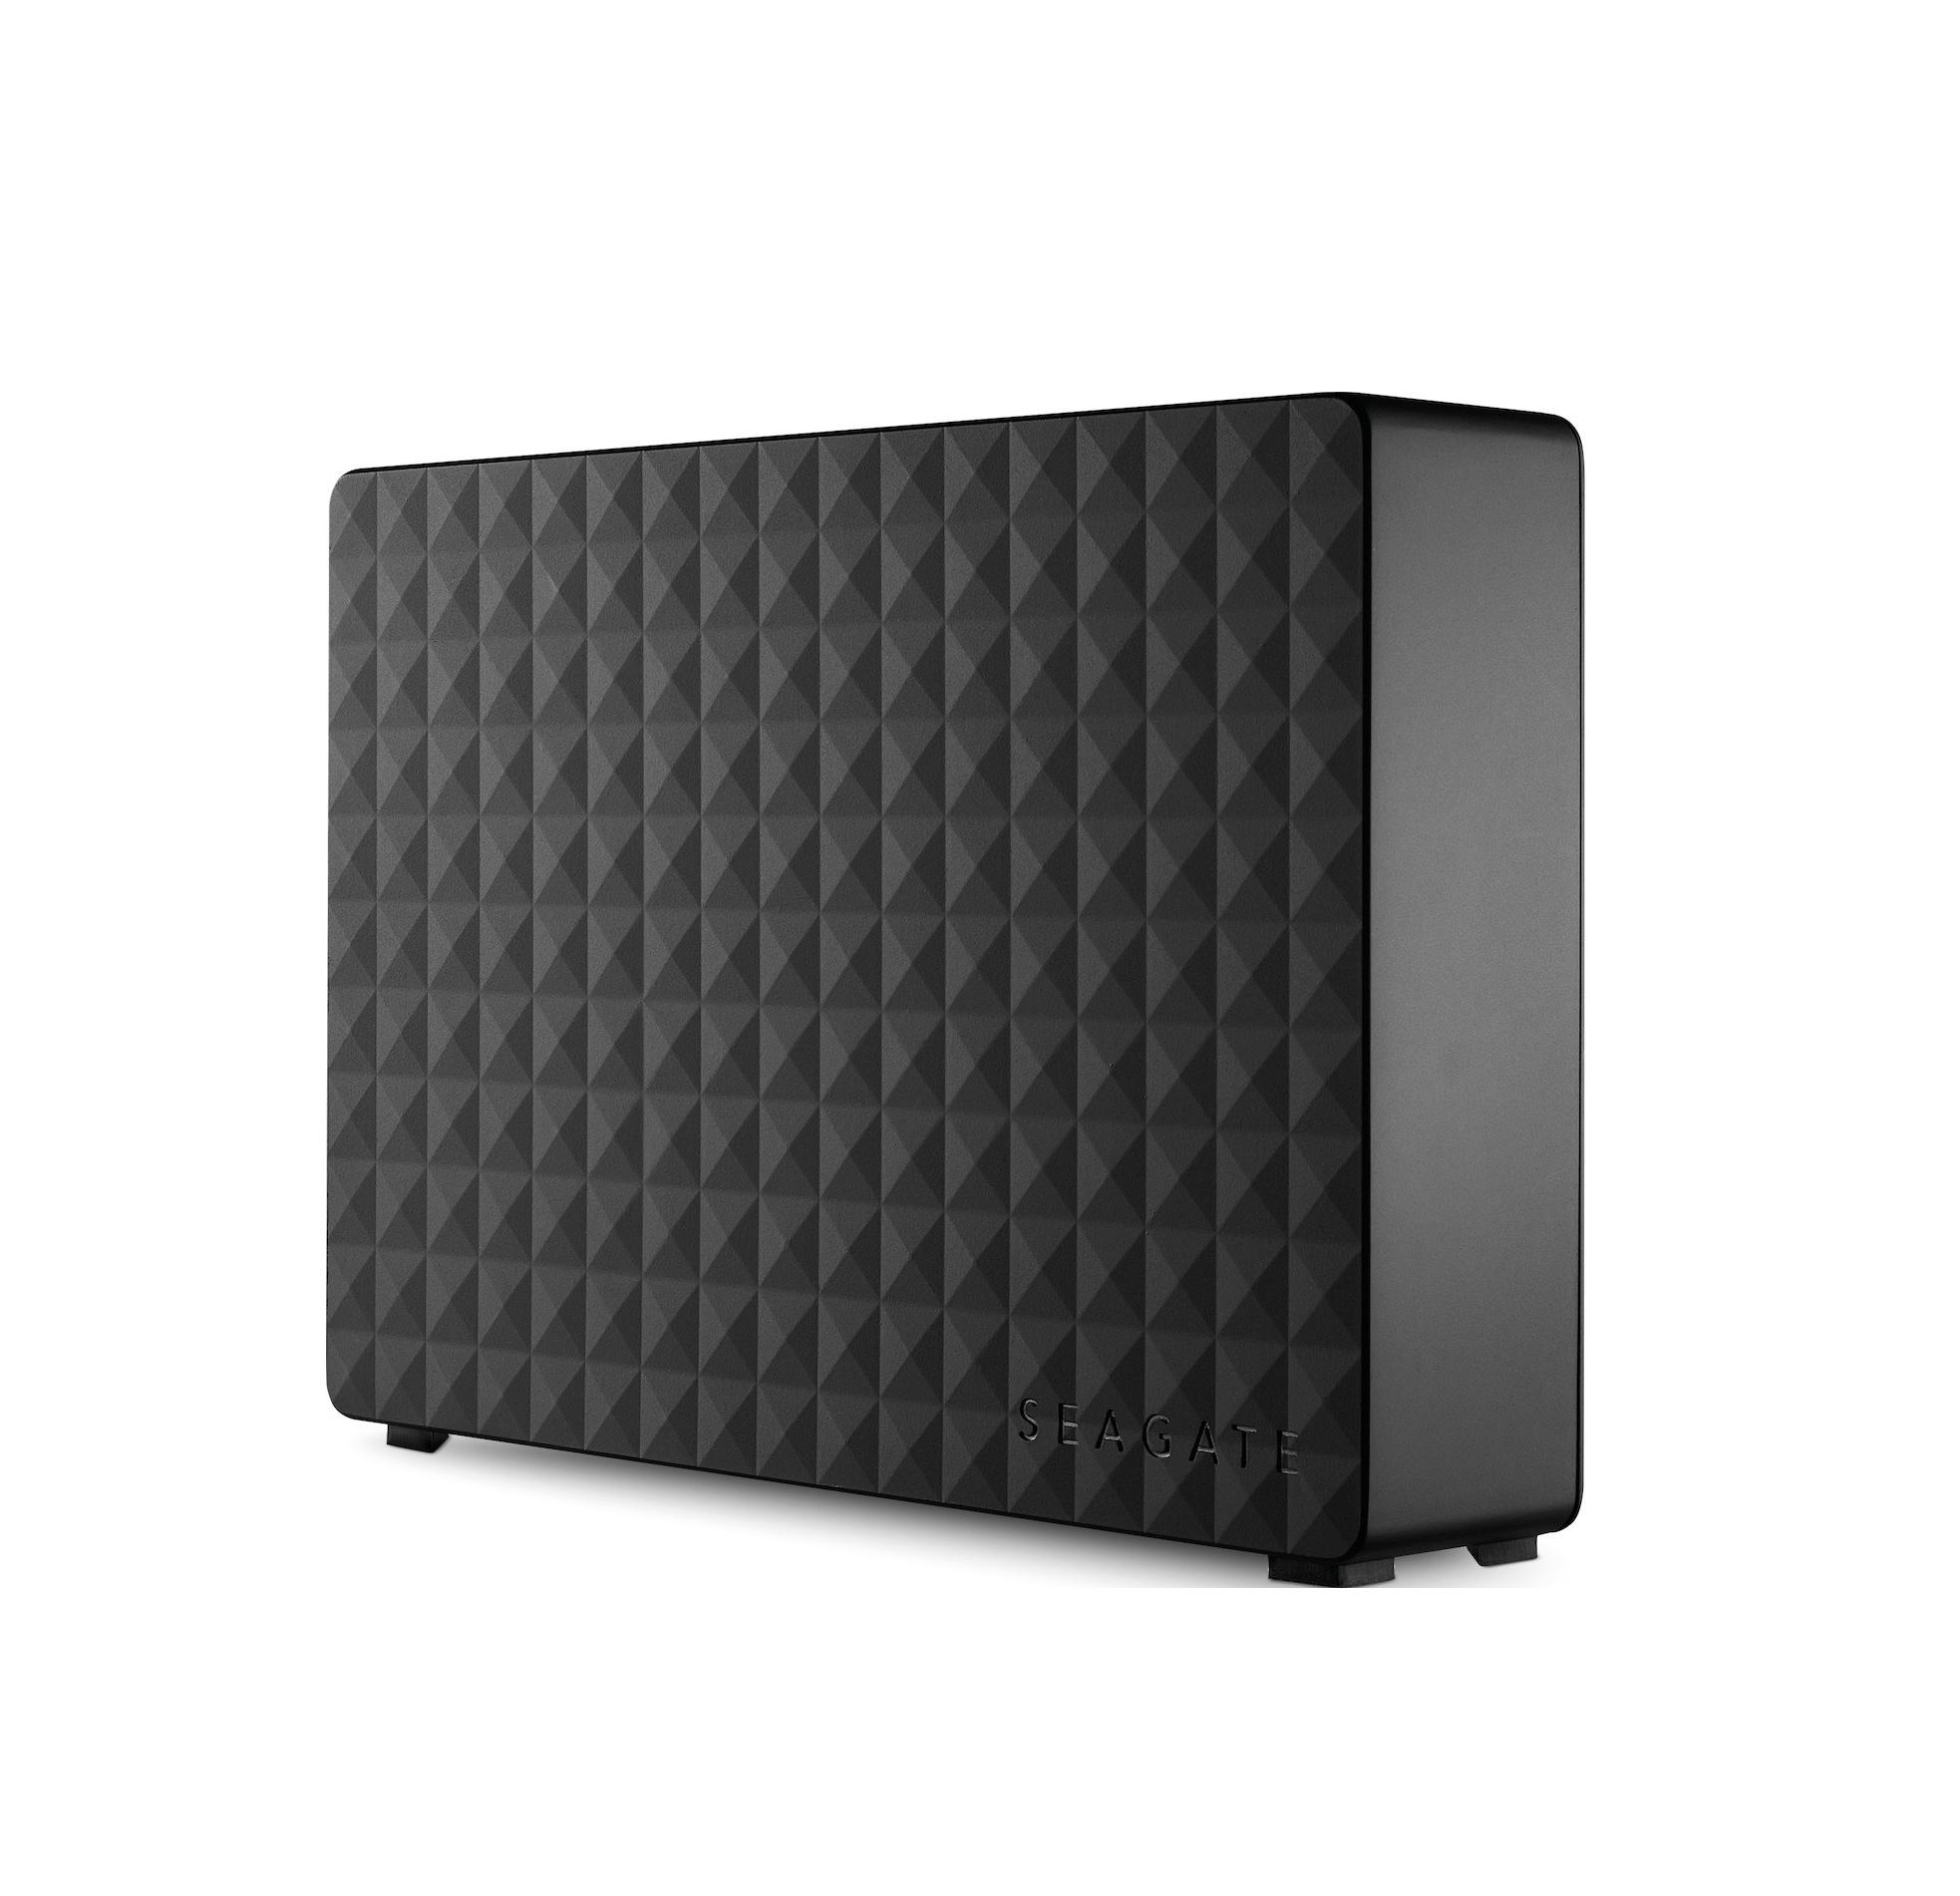 Seagate Expansion Desktop 4TB Εξωτερικός Σκληρός Δίσκος USB 3.0 STEB4000200